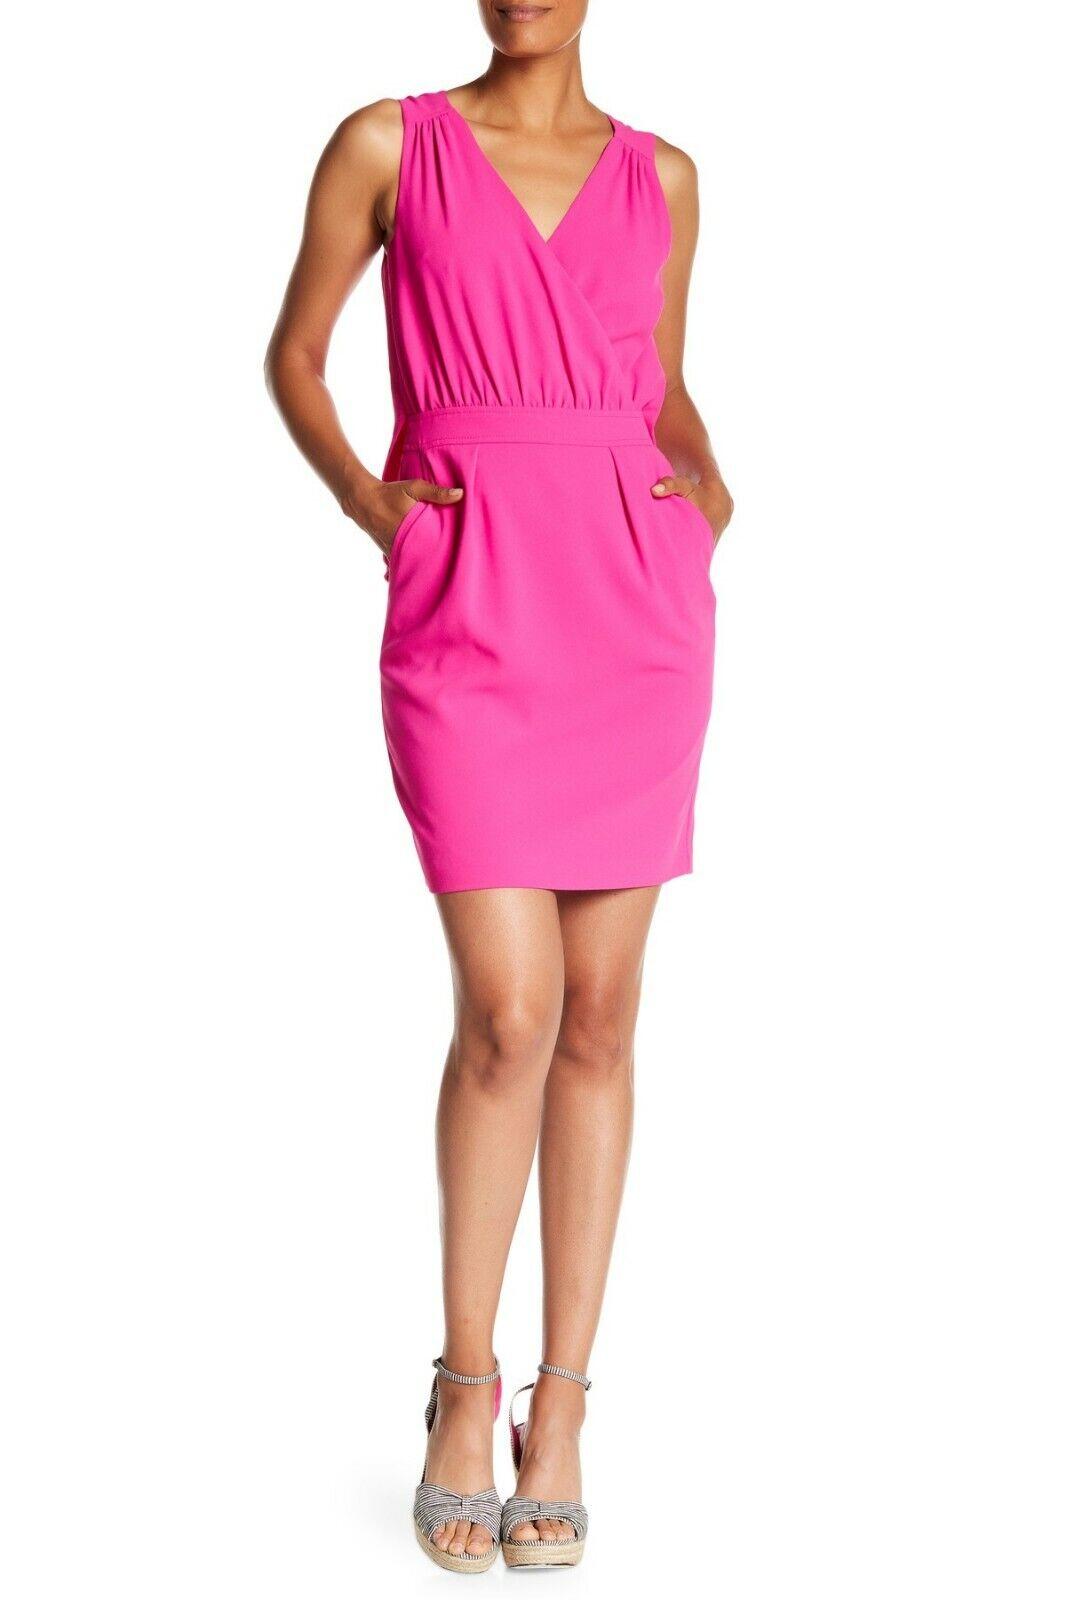 NWT- Trina Turk Abrigo Surplice V-Neck Sleeveless Dress, Brilliant Fuchsia - 2